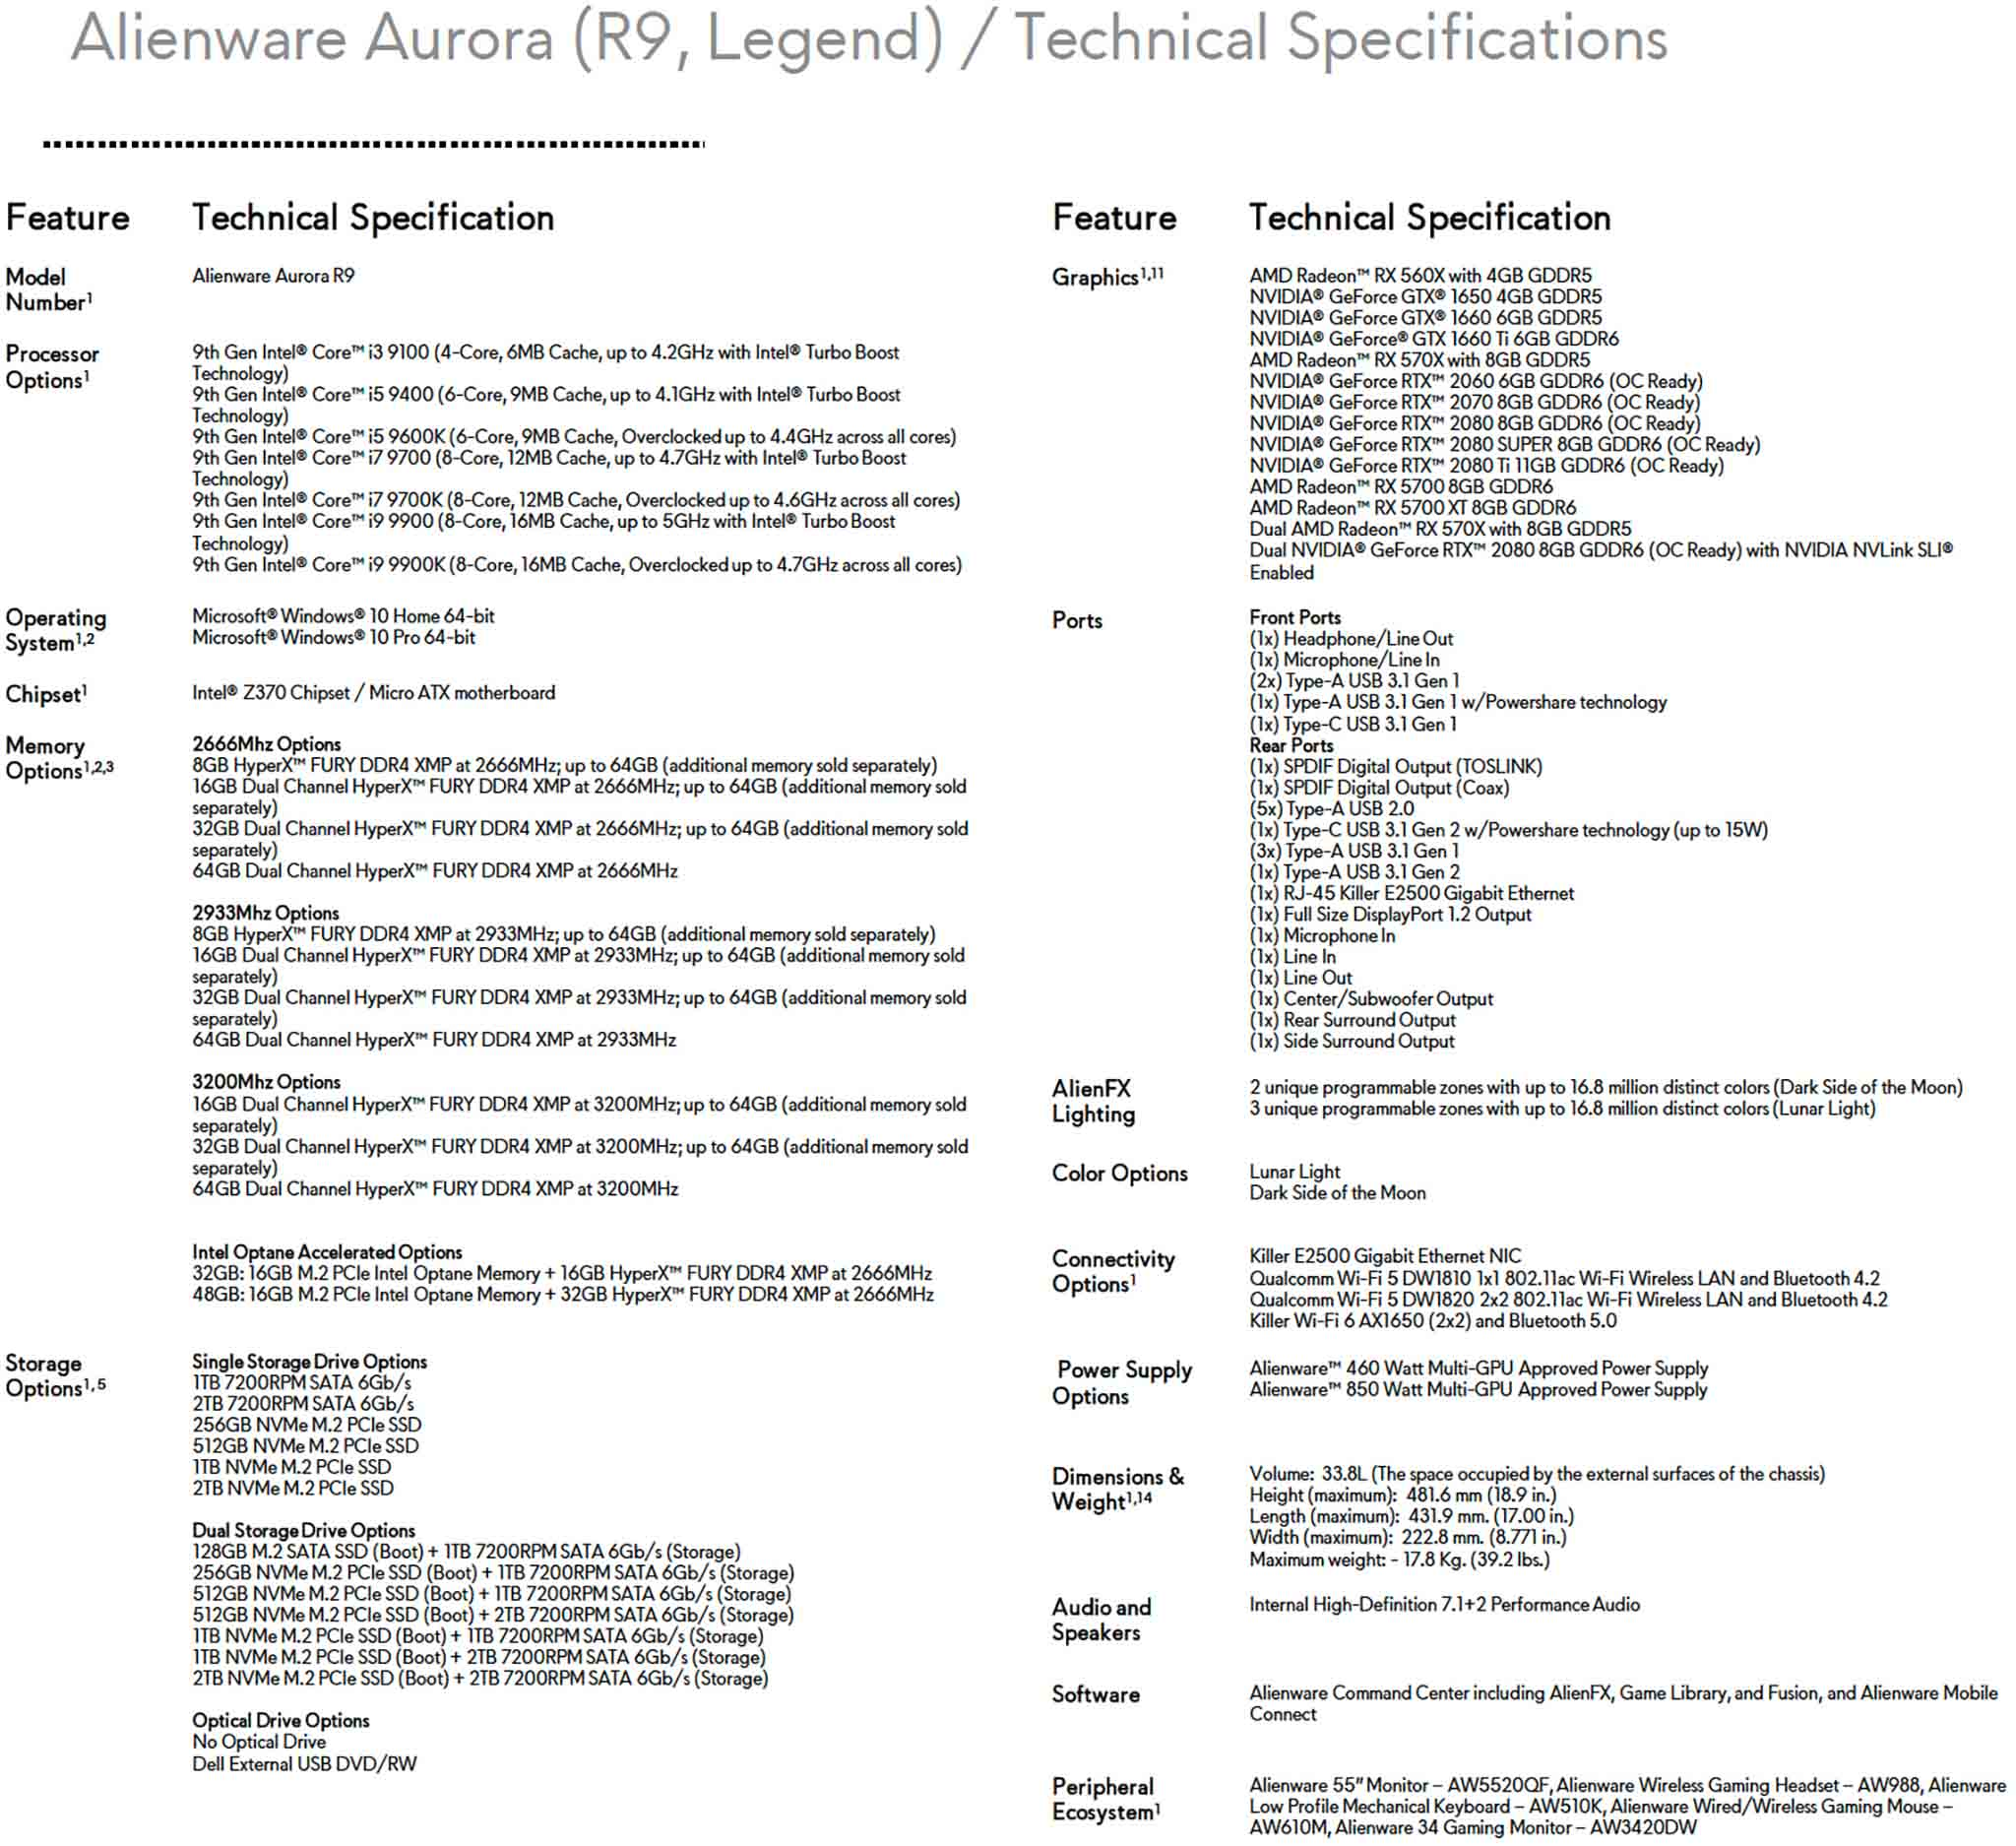 Alienware_Aurora_R9_Specs.jpg